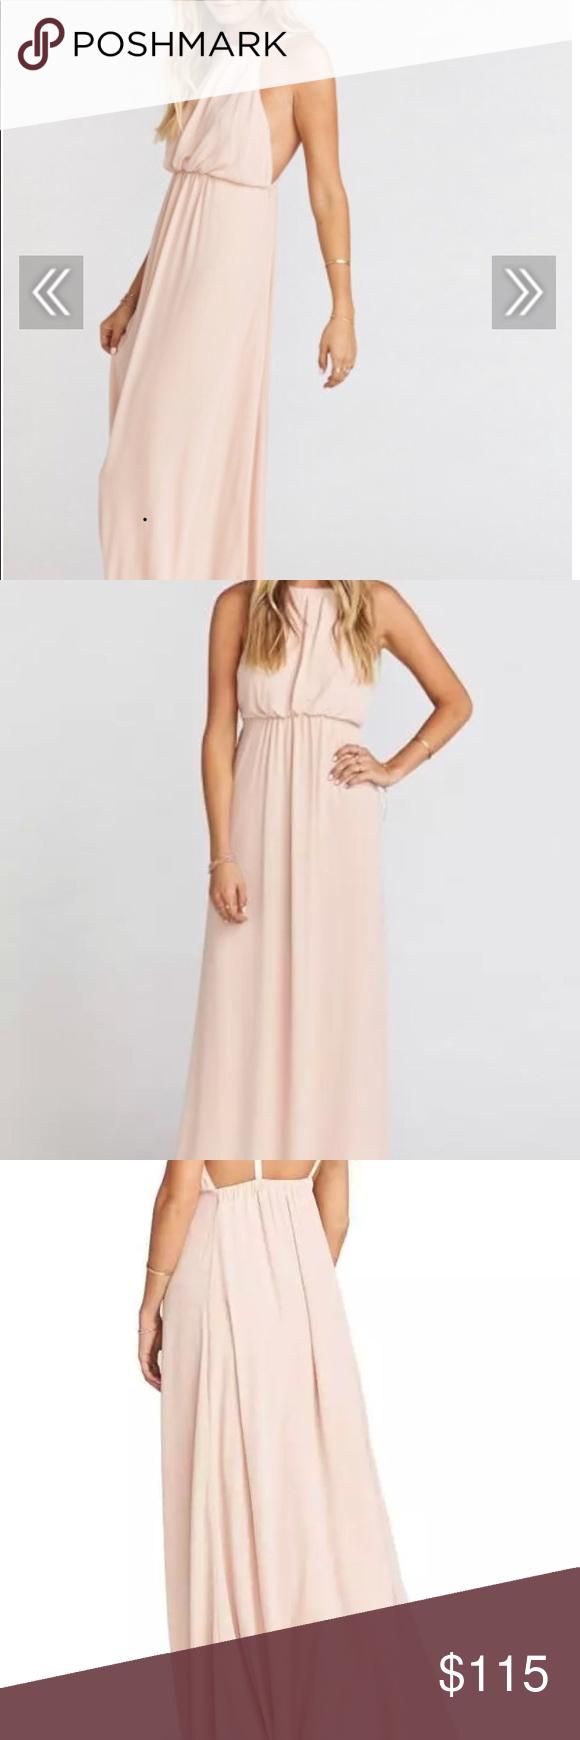 Show Me Your Mumu Amanda Maxi Dress Dusty Blush Size Small